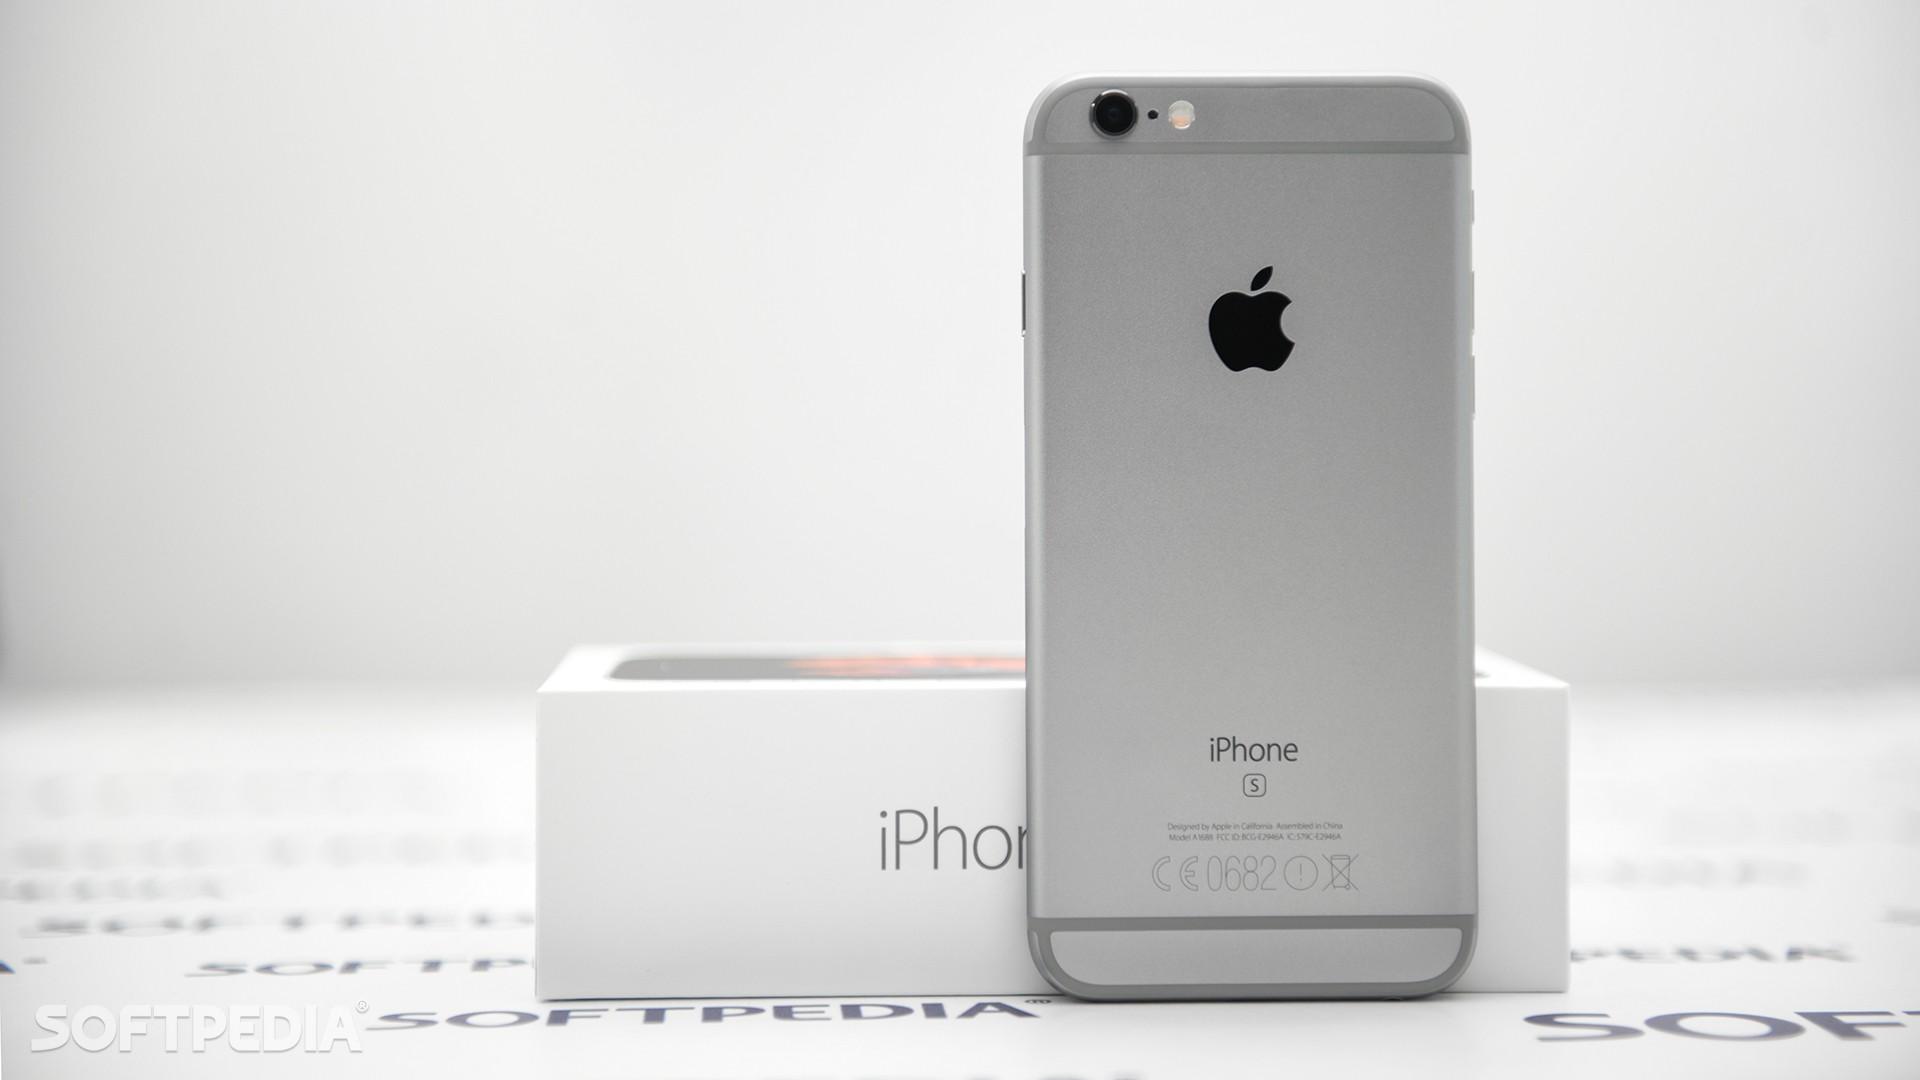 Apple Admits It Has No Idea How FBI Hacked iPhone, Says It